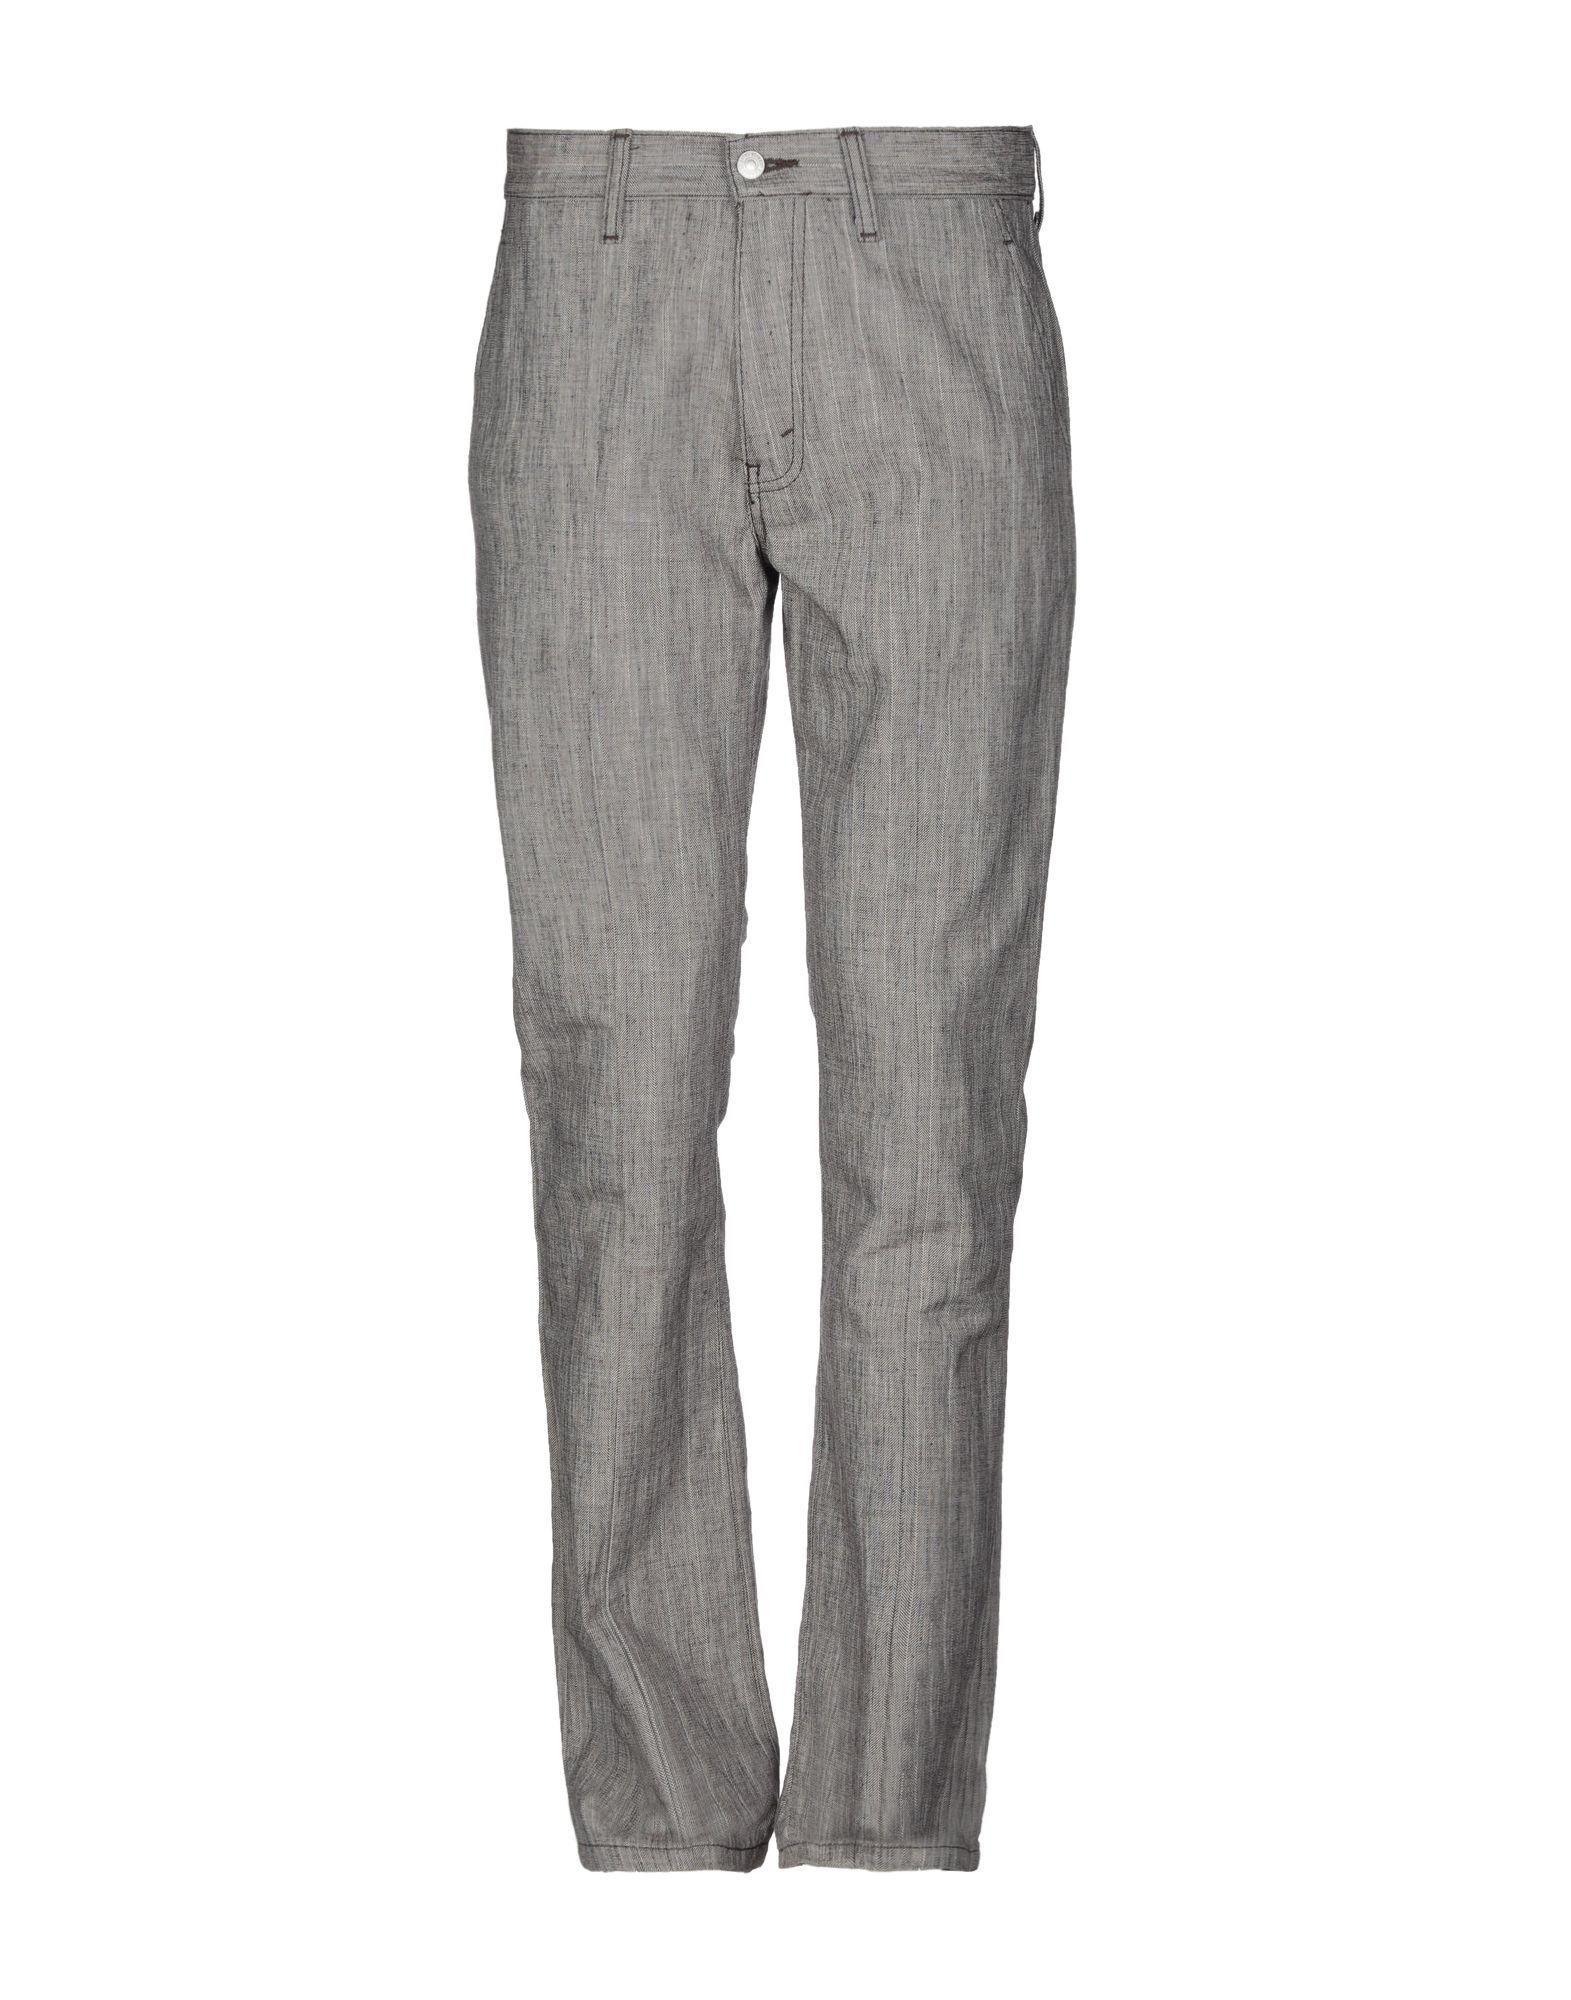 JUNYA WATANABE COMME des GARÇONS MAN X LEVI'S Повседневные брюки junya watanabe бермуды